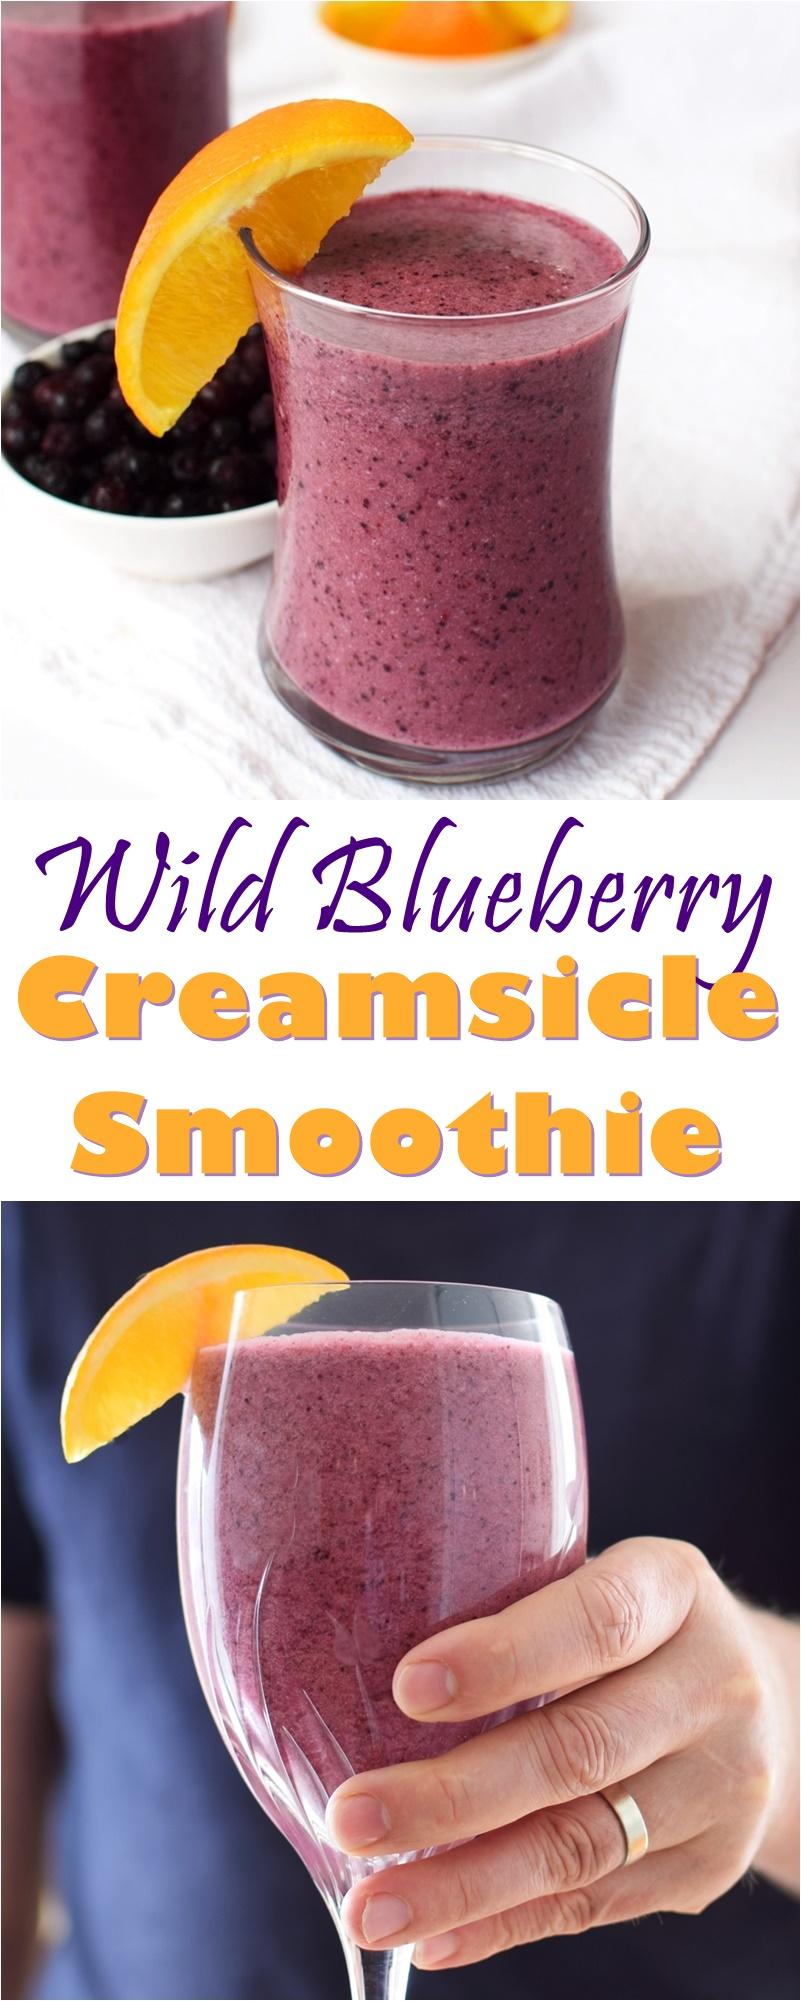 Wild Blueberry Orange Creamsicle Smoothie Recipe (just 4 ingredients!) - healthy, vegan, paleo